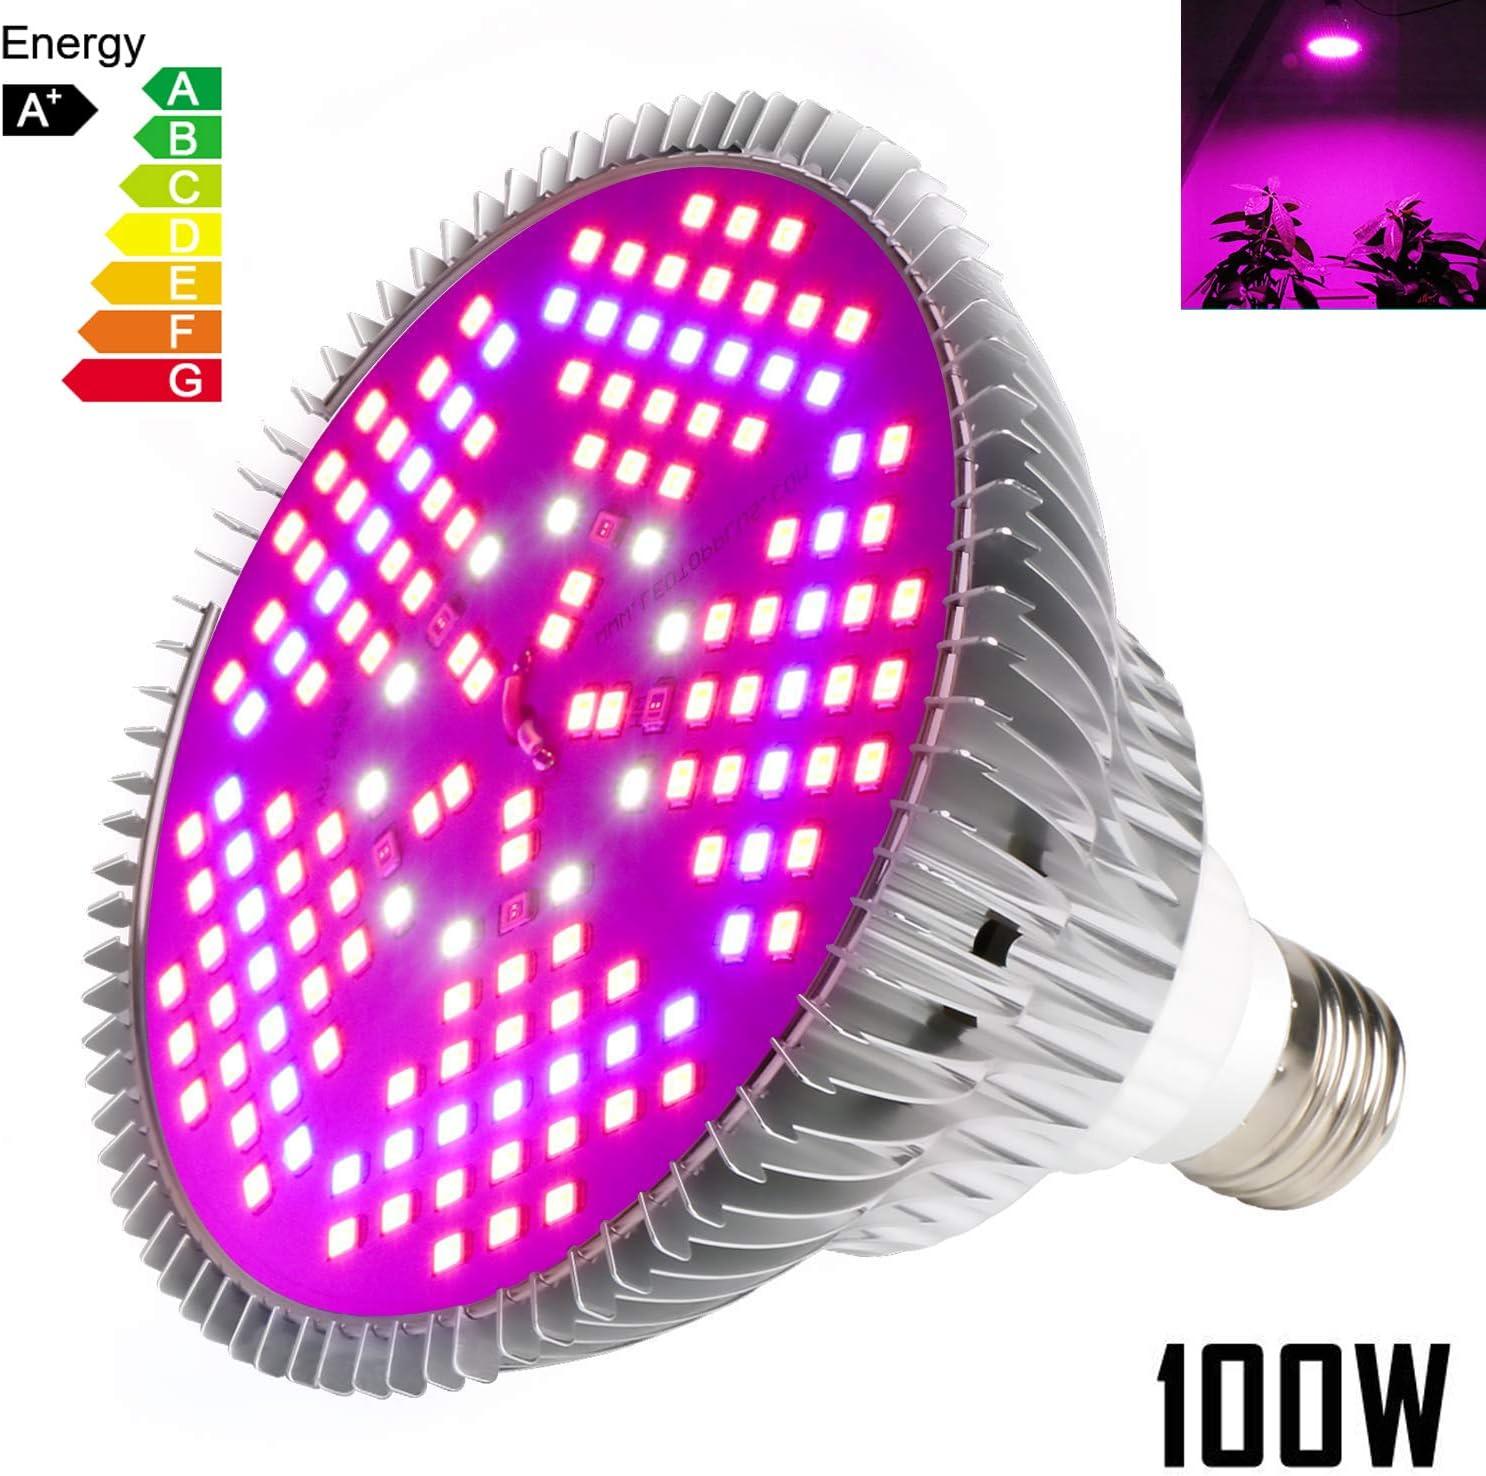 100W Led Grow Light Bulb Full Spectrum,Plant Light Bulb with 150 LEDs for Indoor Plants,E26/E27 Socket,Grow Lamp for Hydroponic Indoor Garden Greenhouse Succulent Veg Flower